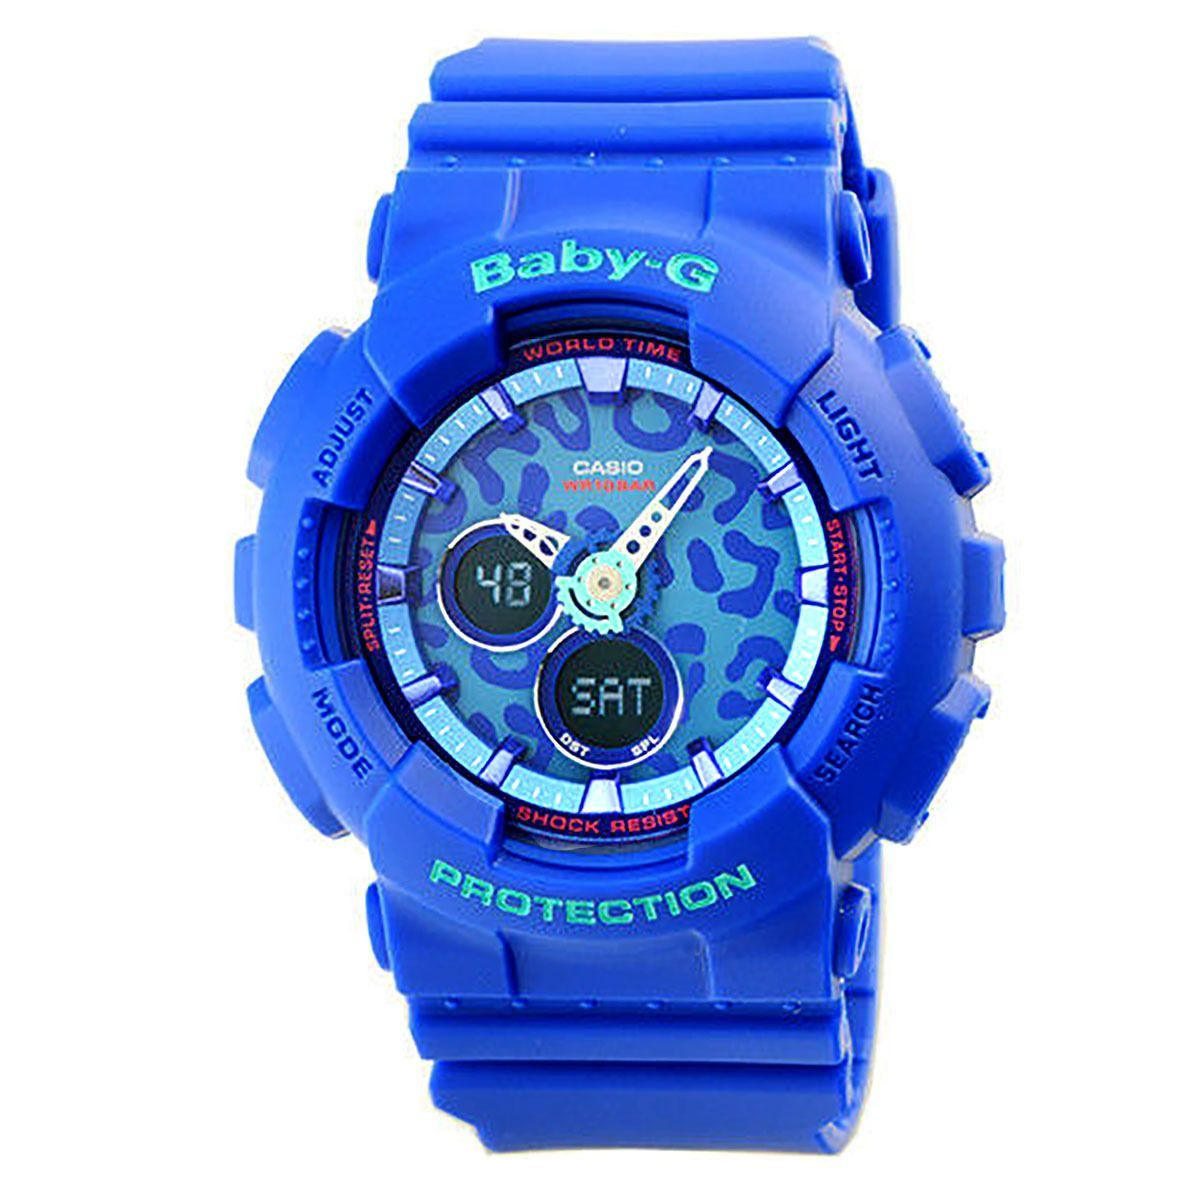 Casio Baby G Ba 120lp 2a Leopard Design Analog Digital Blue Resin 112 4a Pink Ladies Watch